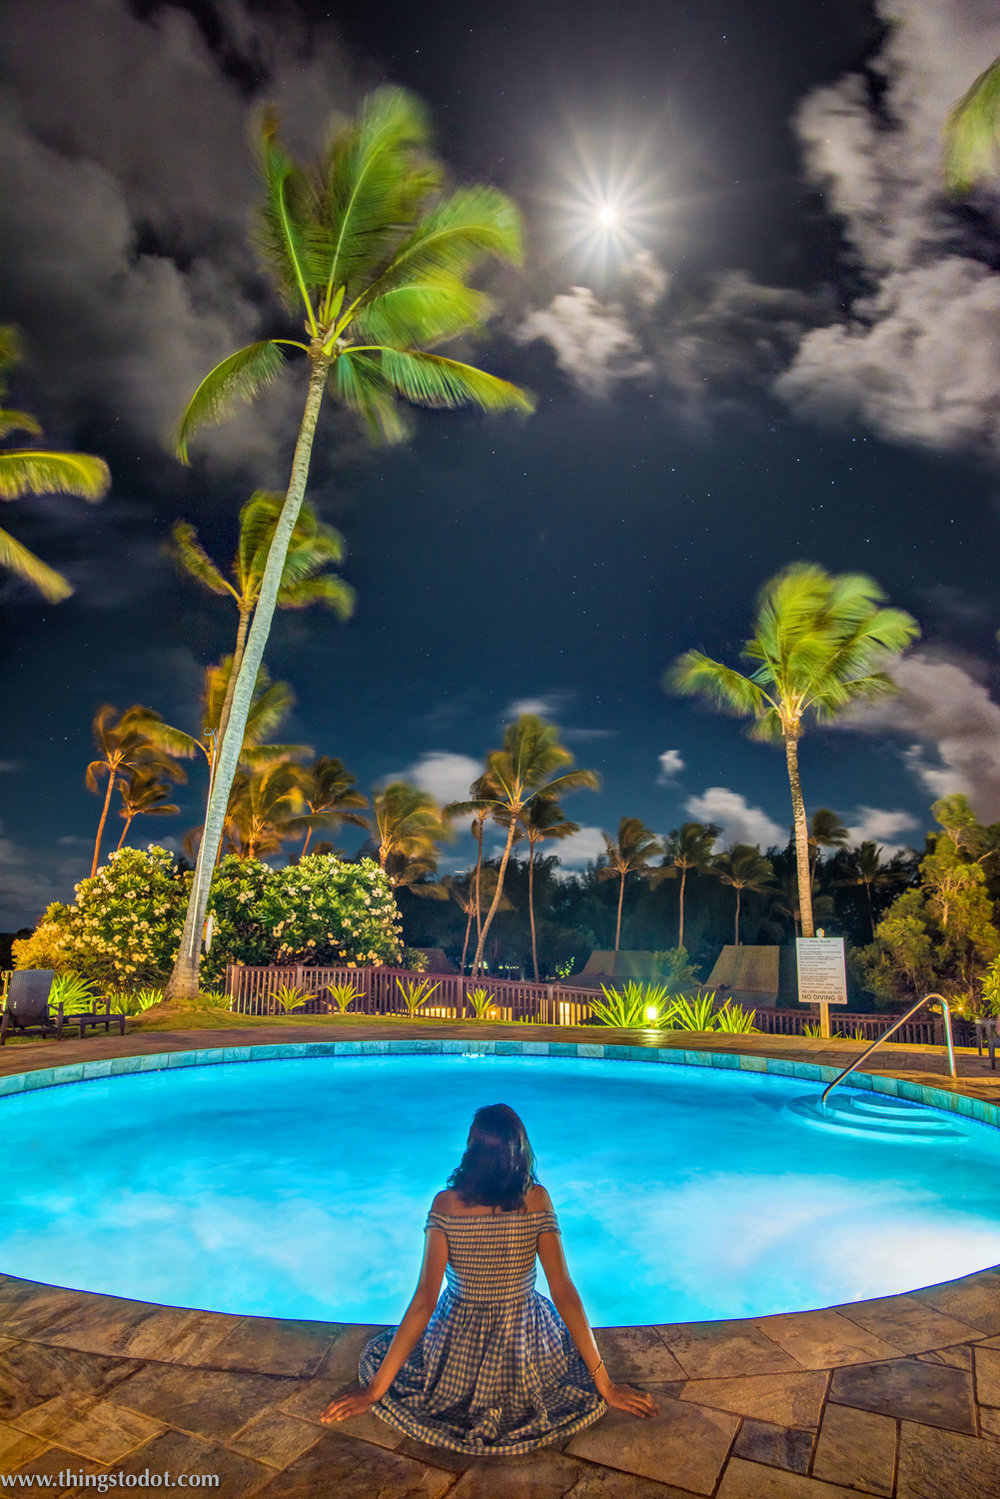 Hilton Garden Inn, Kapaa, Kauai, Hawaii. Photo: Patrick Kelley, www.pk-worldwide.com. Image©www.thingstodot.com